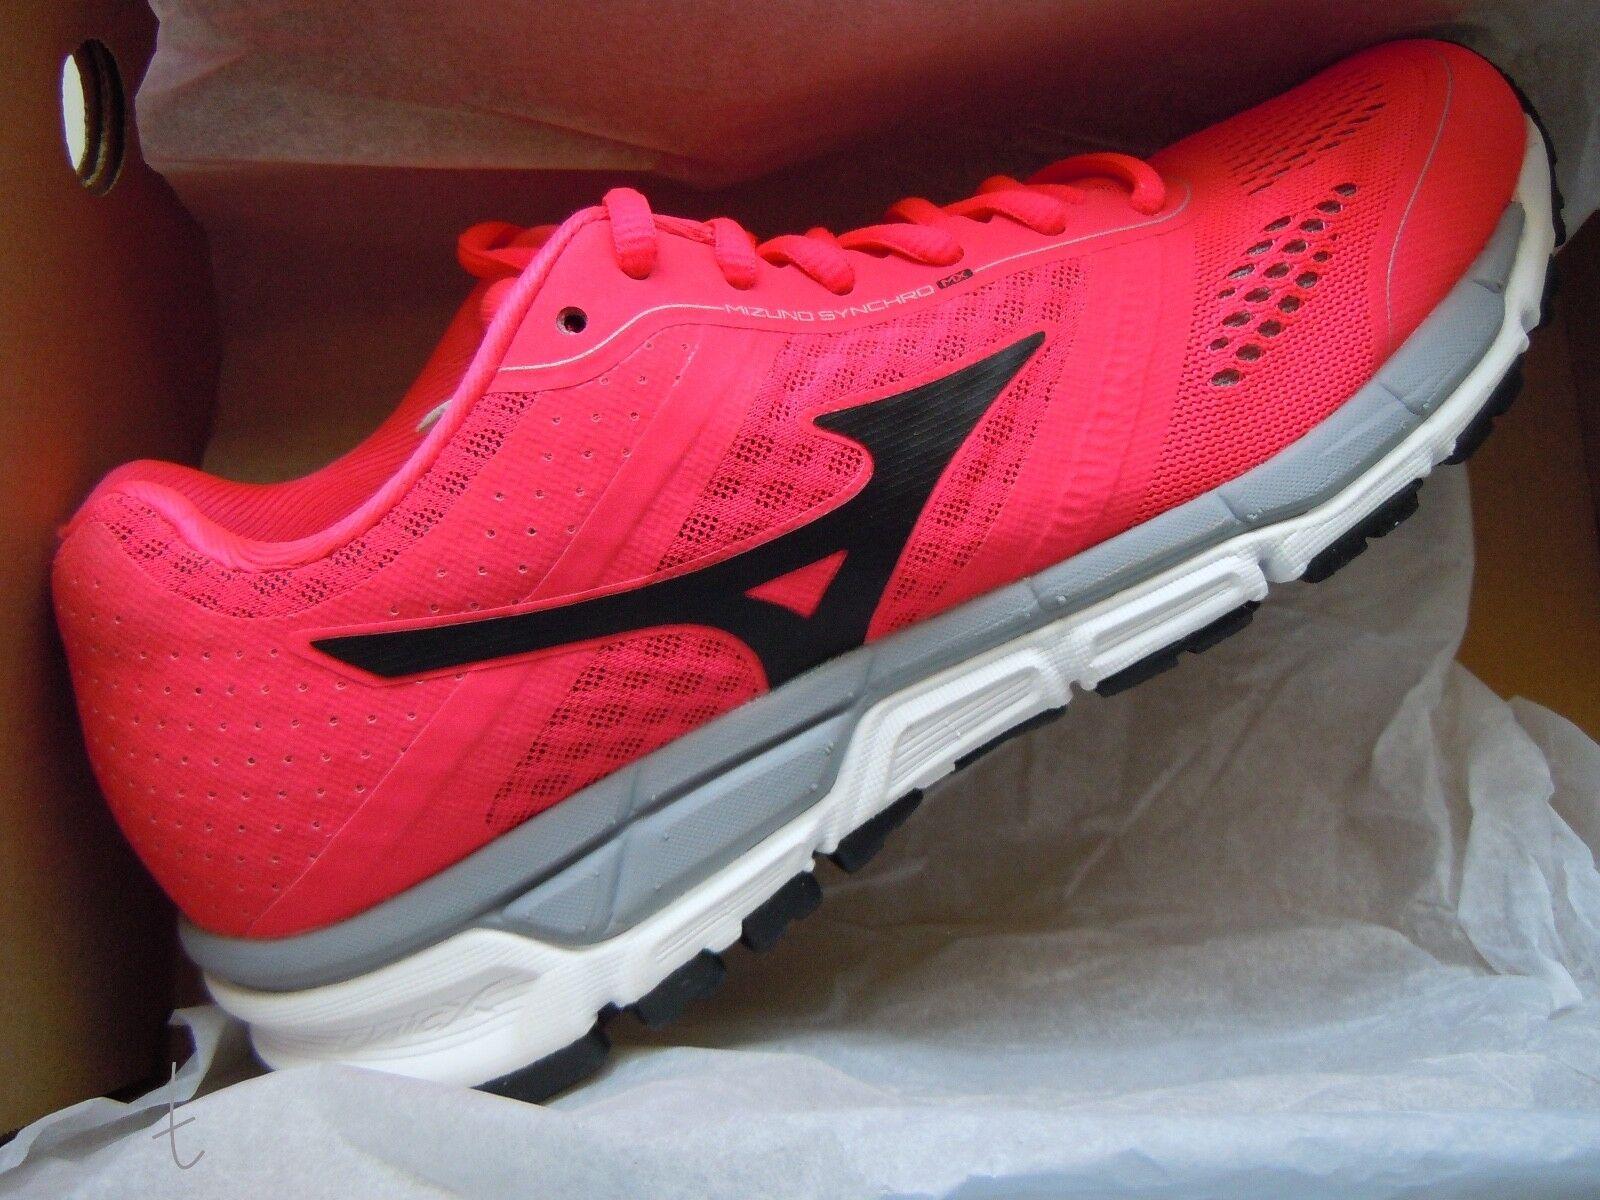 Mizuno Synchro MX (women's) ___ Size 10.5  ___ Last pair, running, pink, wave